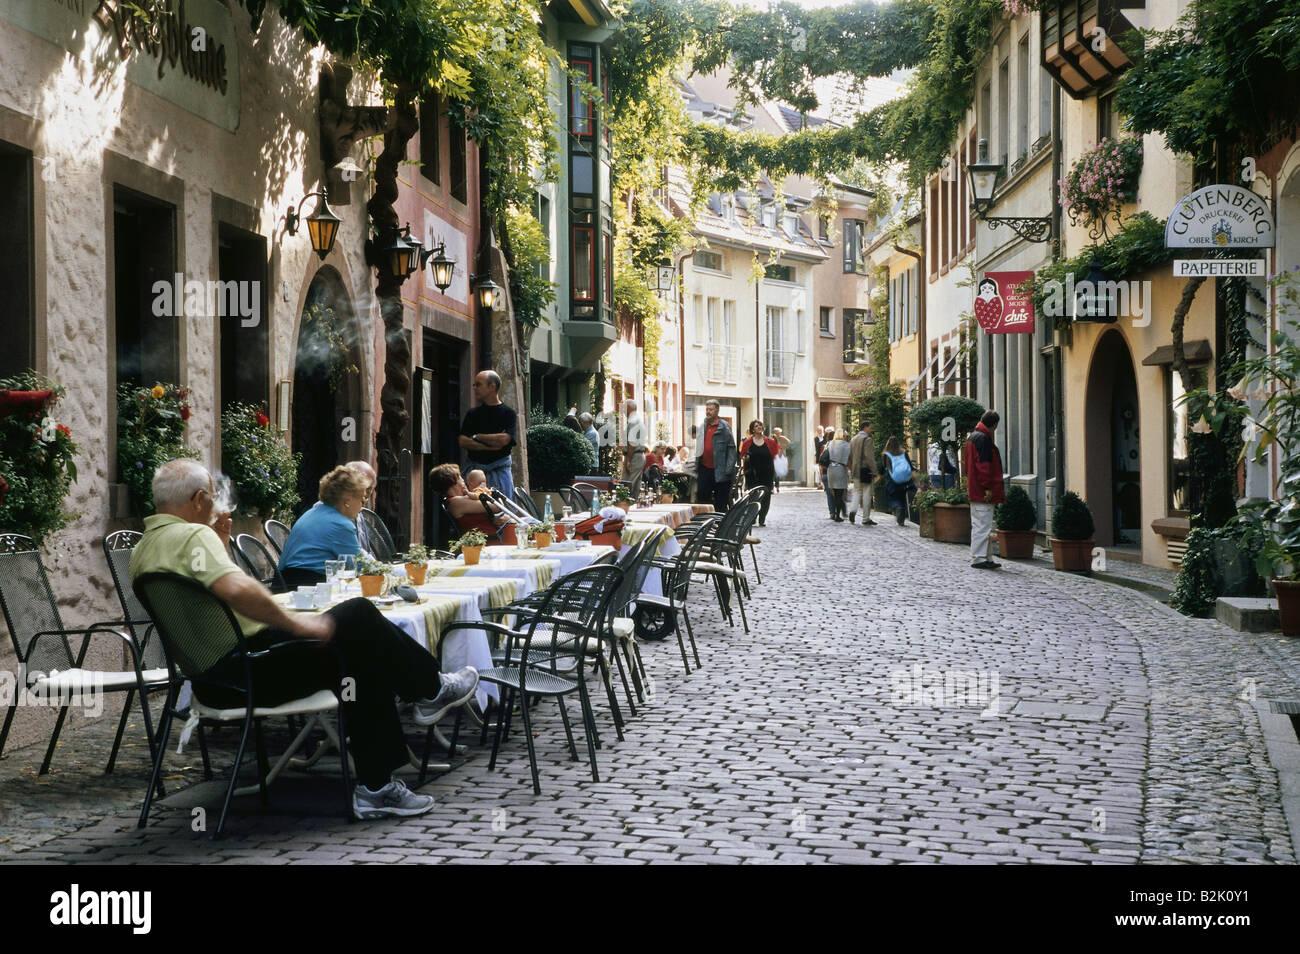 Cafe In Freiburg City